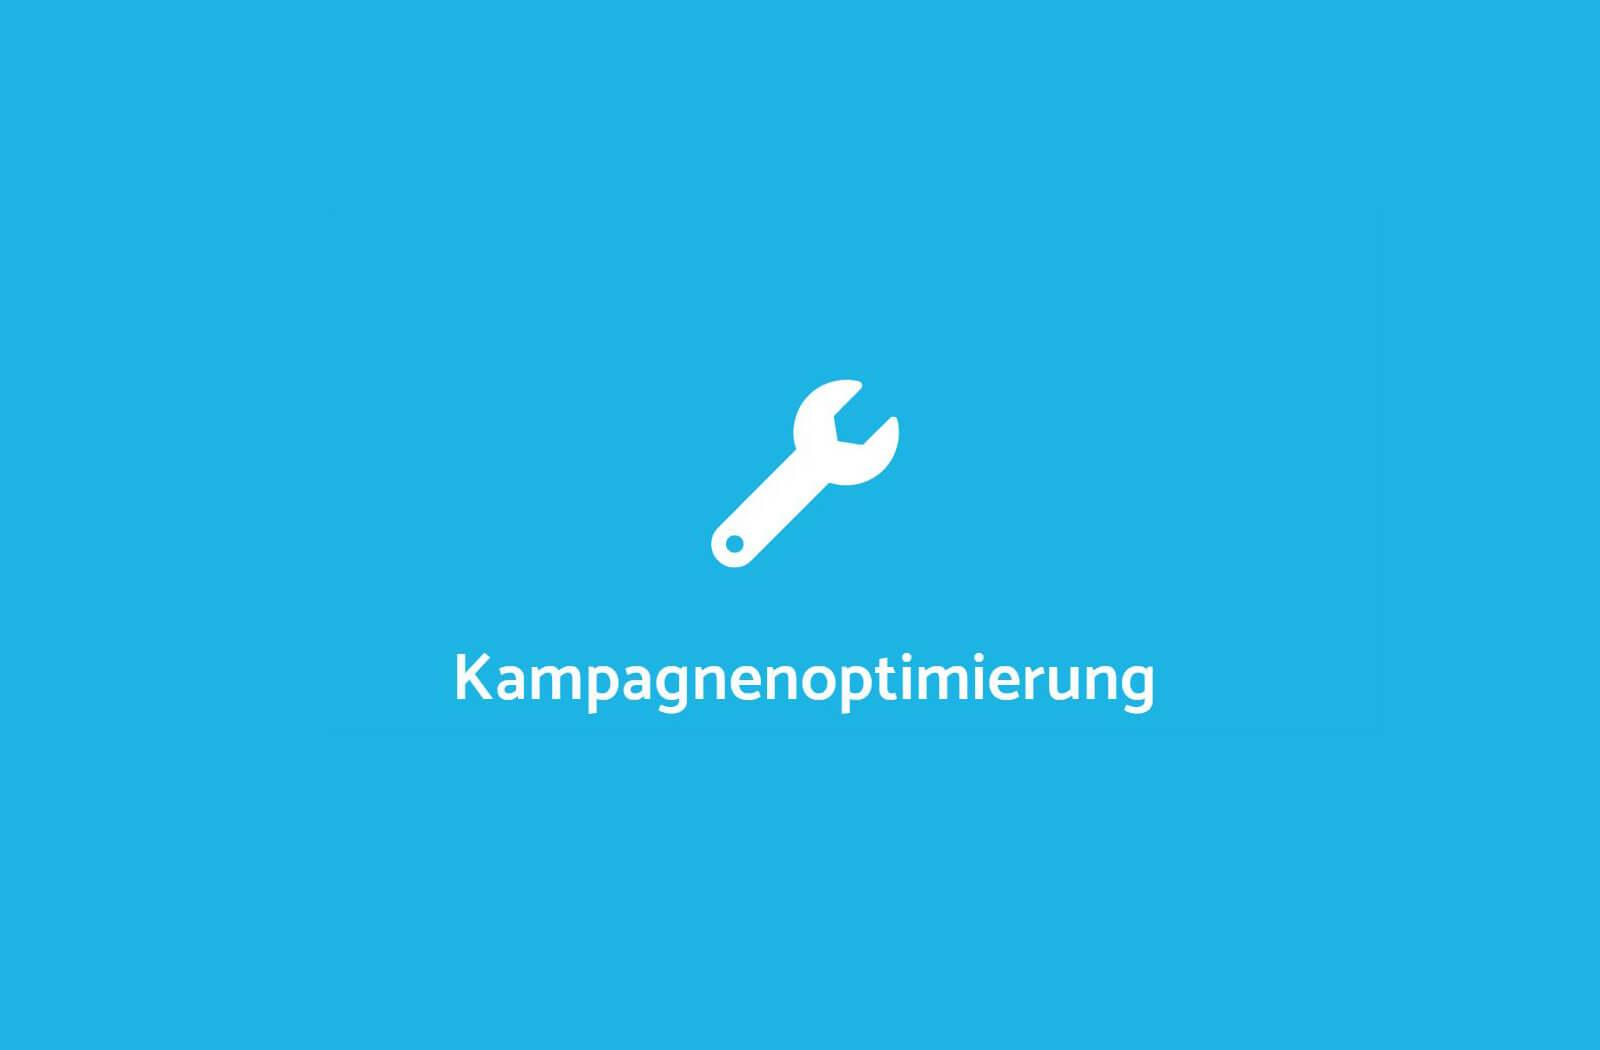 Kampagnenoptimierung im Google AdWords Tool